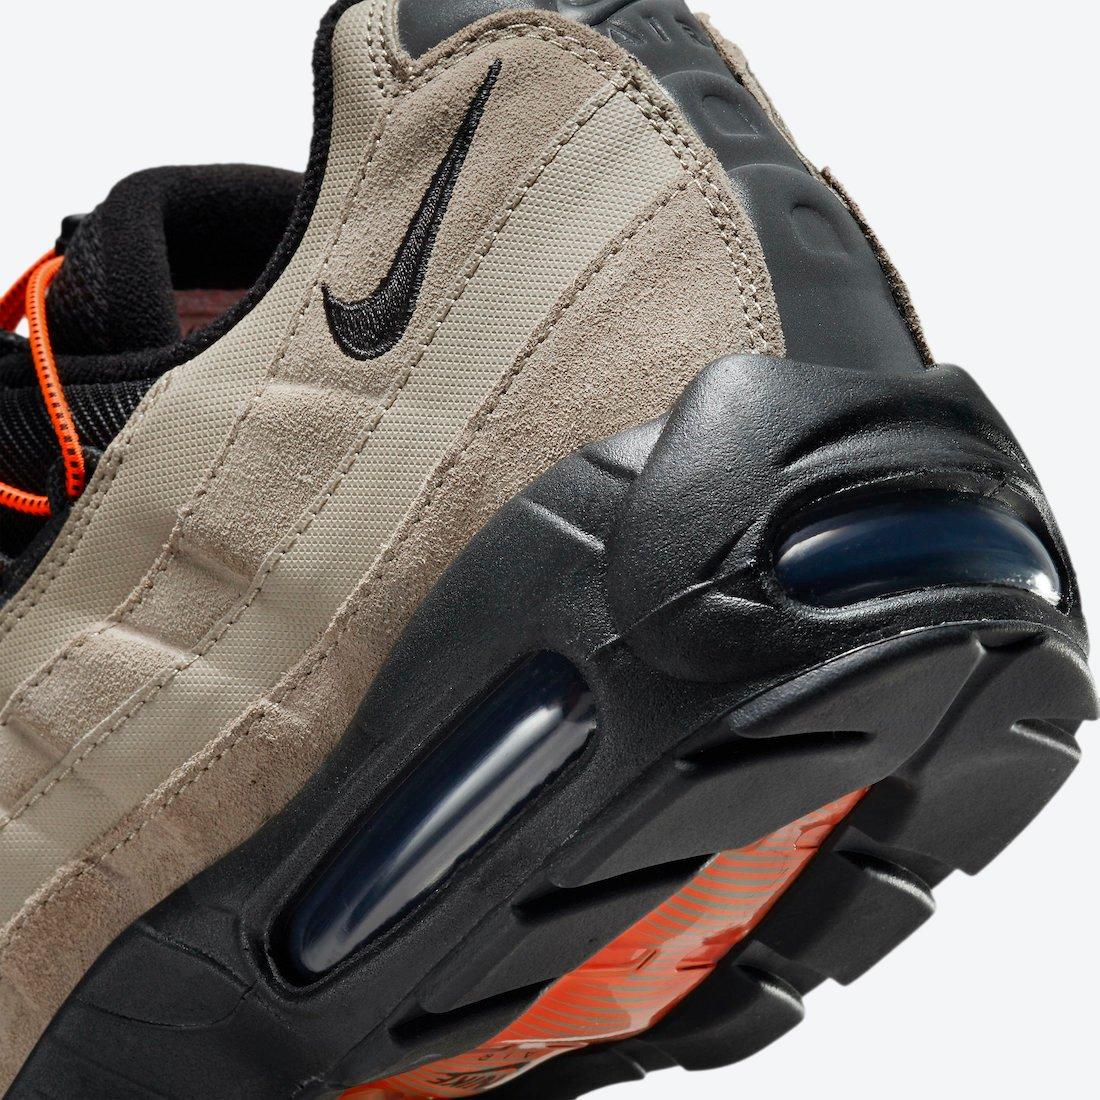 Nike Air Max 95 Khaki Total Orange Black DO6391-200 Release Date Info